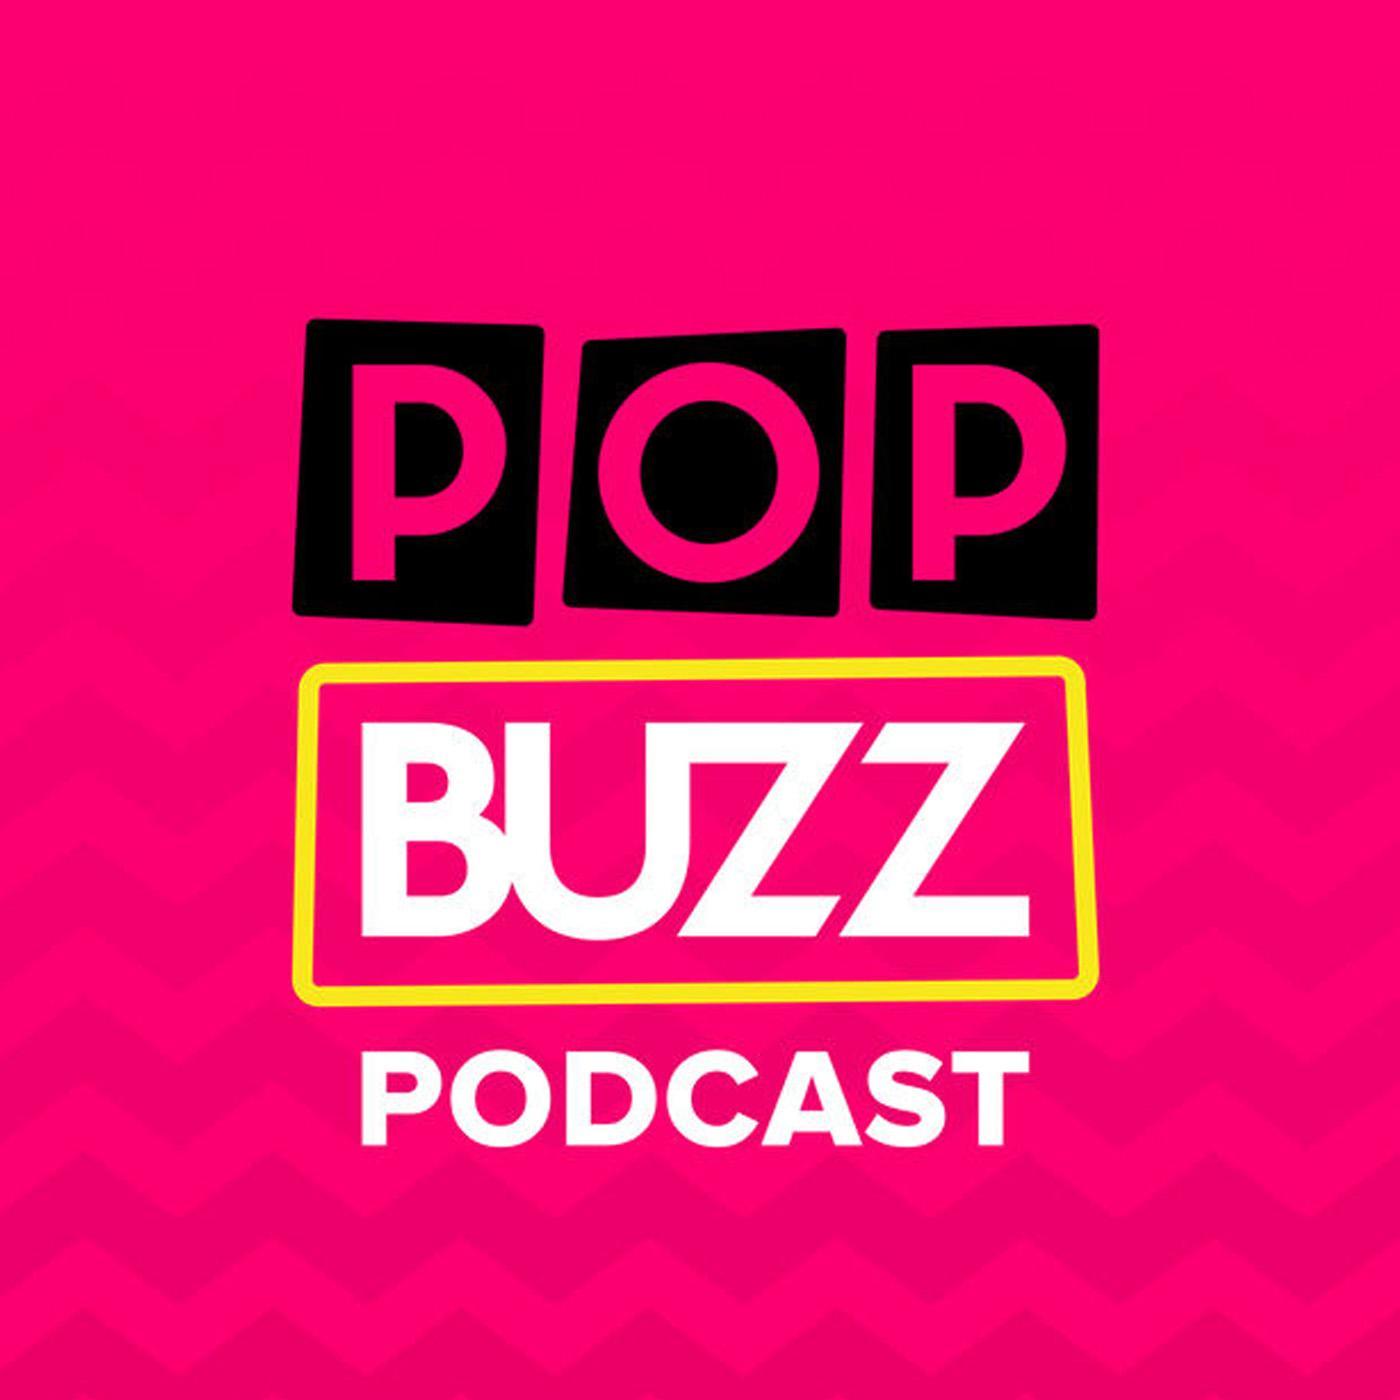 Ep 59: Troye Sivan Talks New Music & Enters The PopBuzz